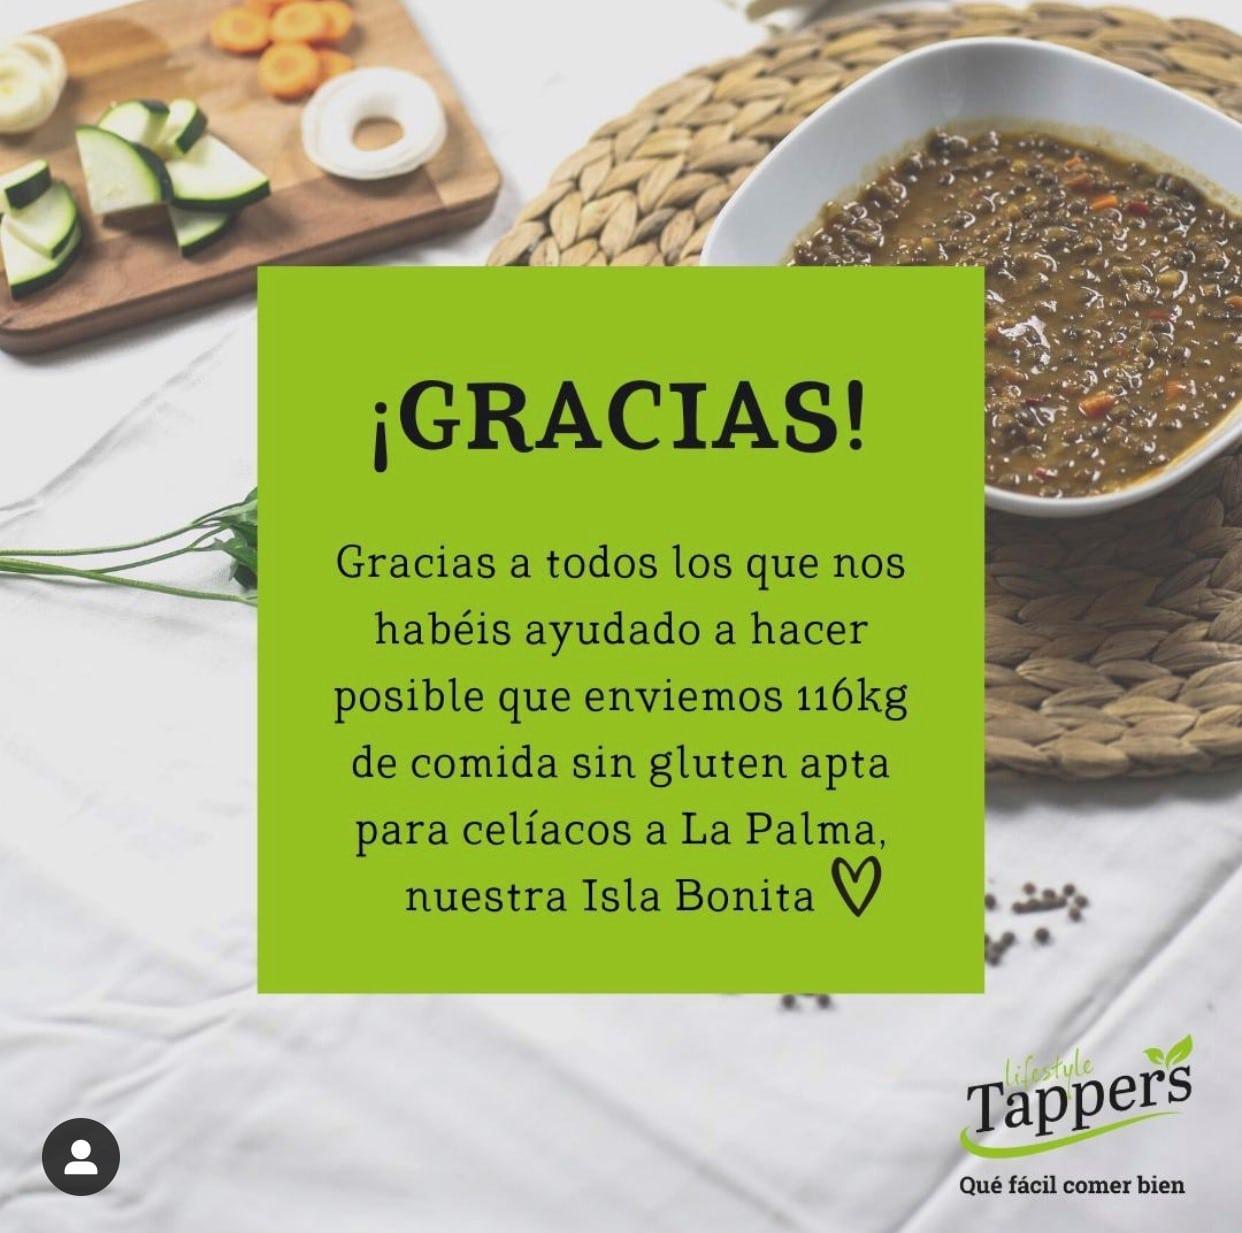 Gracias Tappers